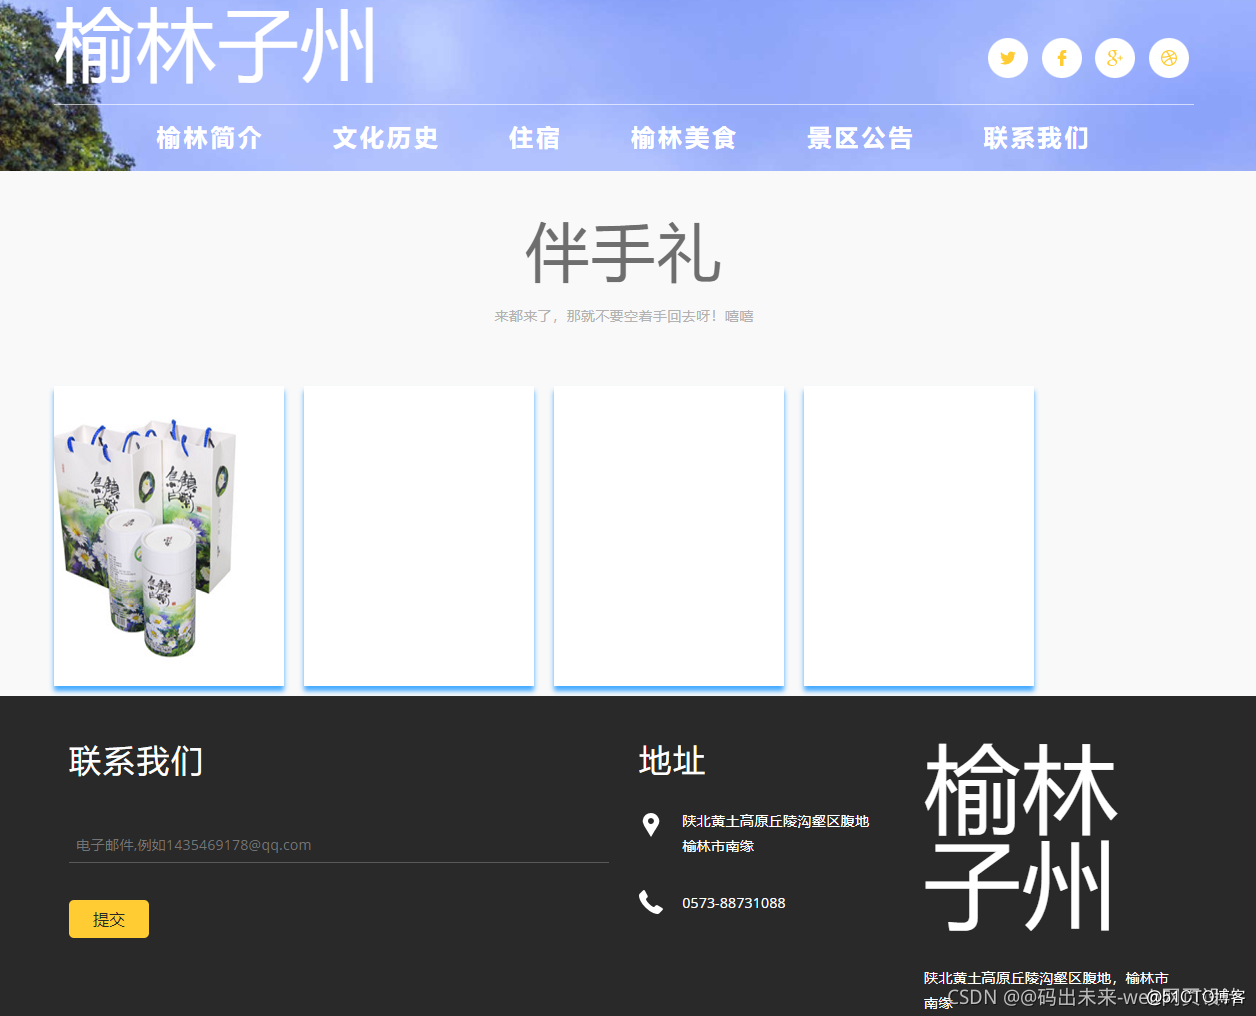 HTML5期末大作业:关于旅游景点介绍的HTML网页设计——榆林子州 8页 (含毕设论文9000字) 建议收藏_html_06